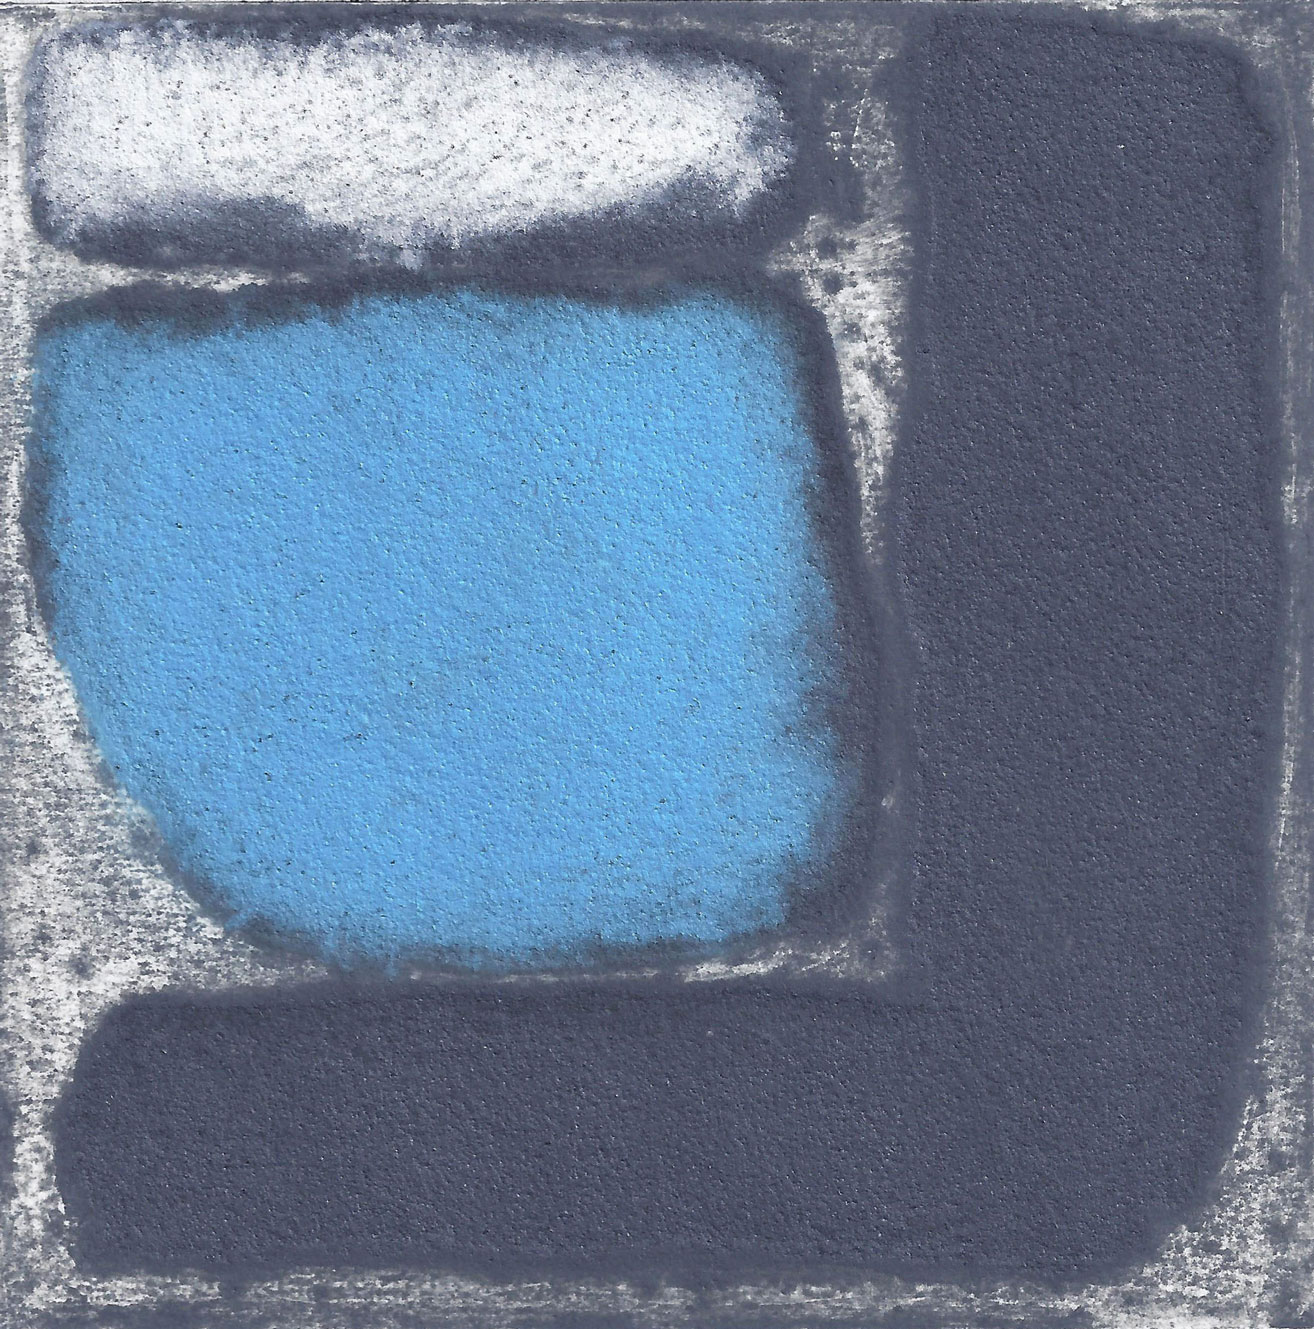 Catherine Headley, Granite and Blue